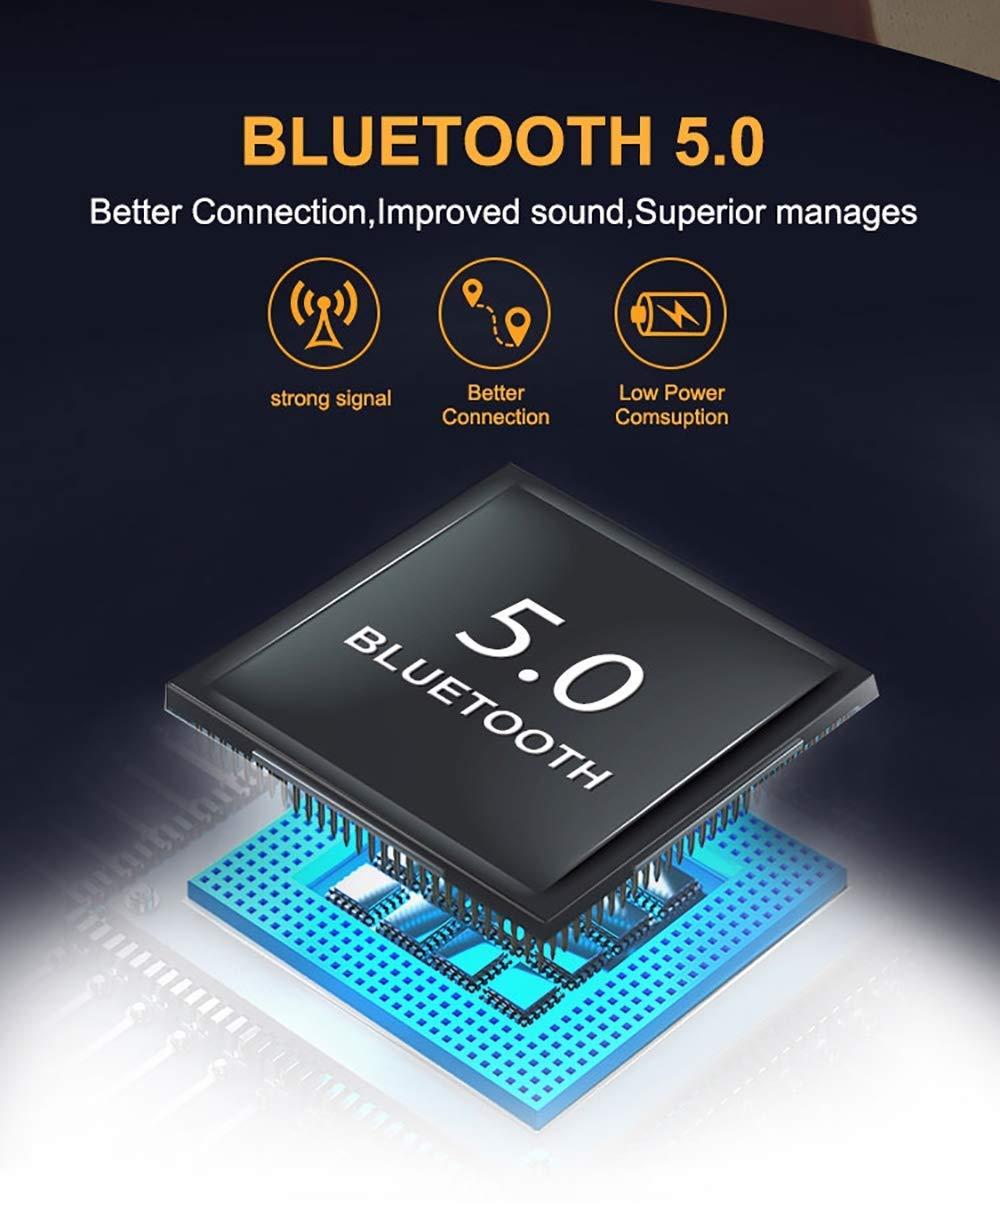 5.0 Auricolari Bluetooth Senza Fili in Ear con Custodia da Ricarica Microfono Leggeri Hi-Fi Cuffie per iPhone Sport